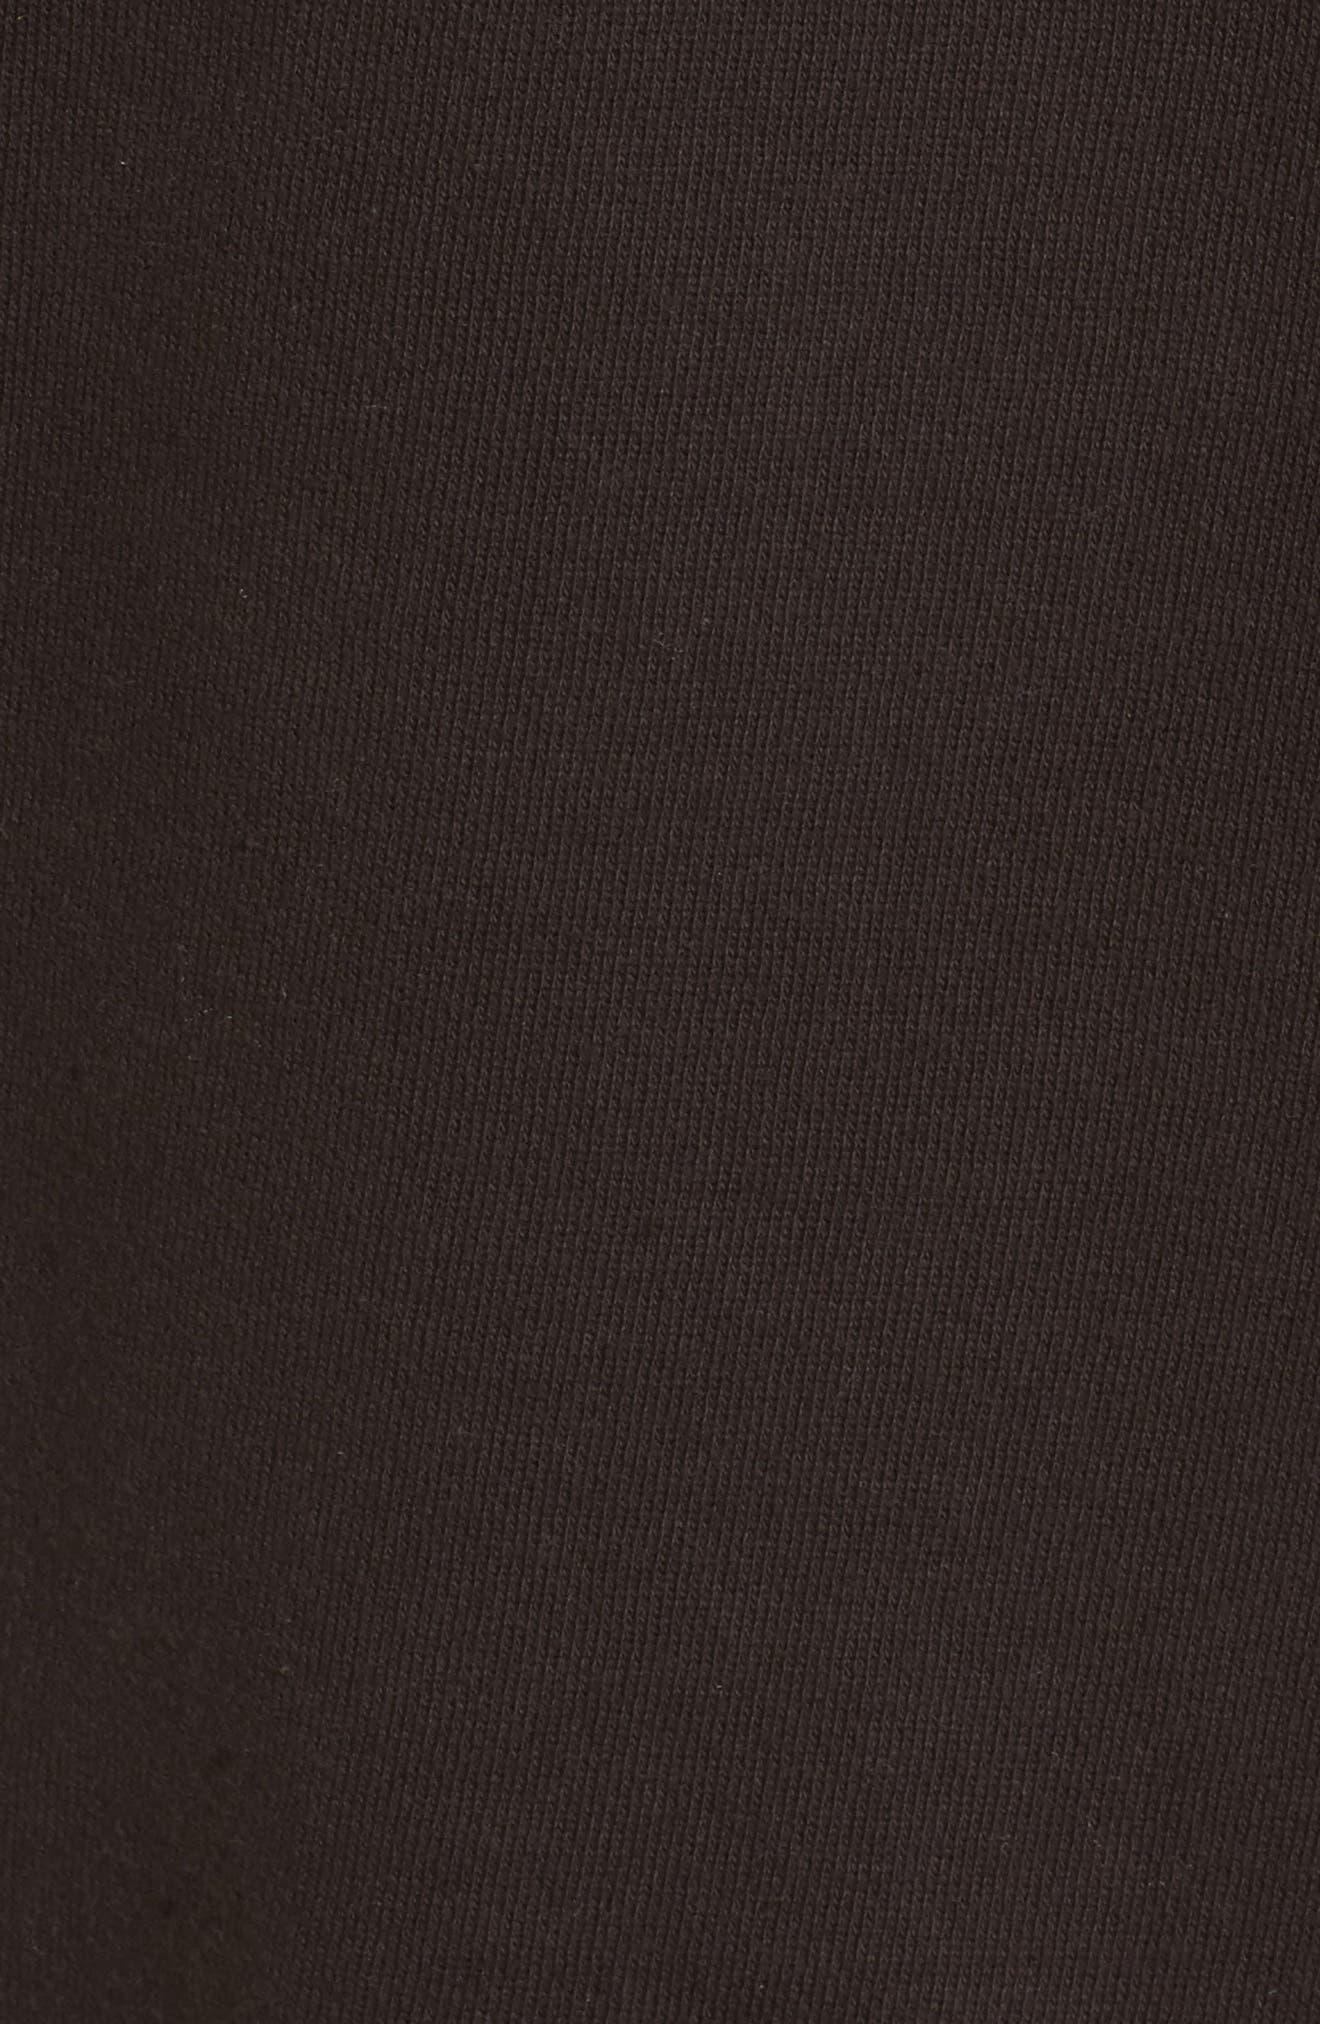 x Donald Robertson Stripe Dresses High/Low Hoodie,                             Alternate thumbnail 5, color,                             Black